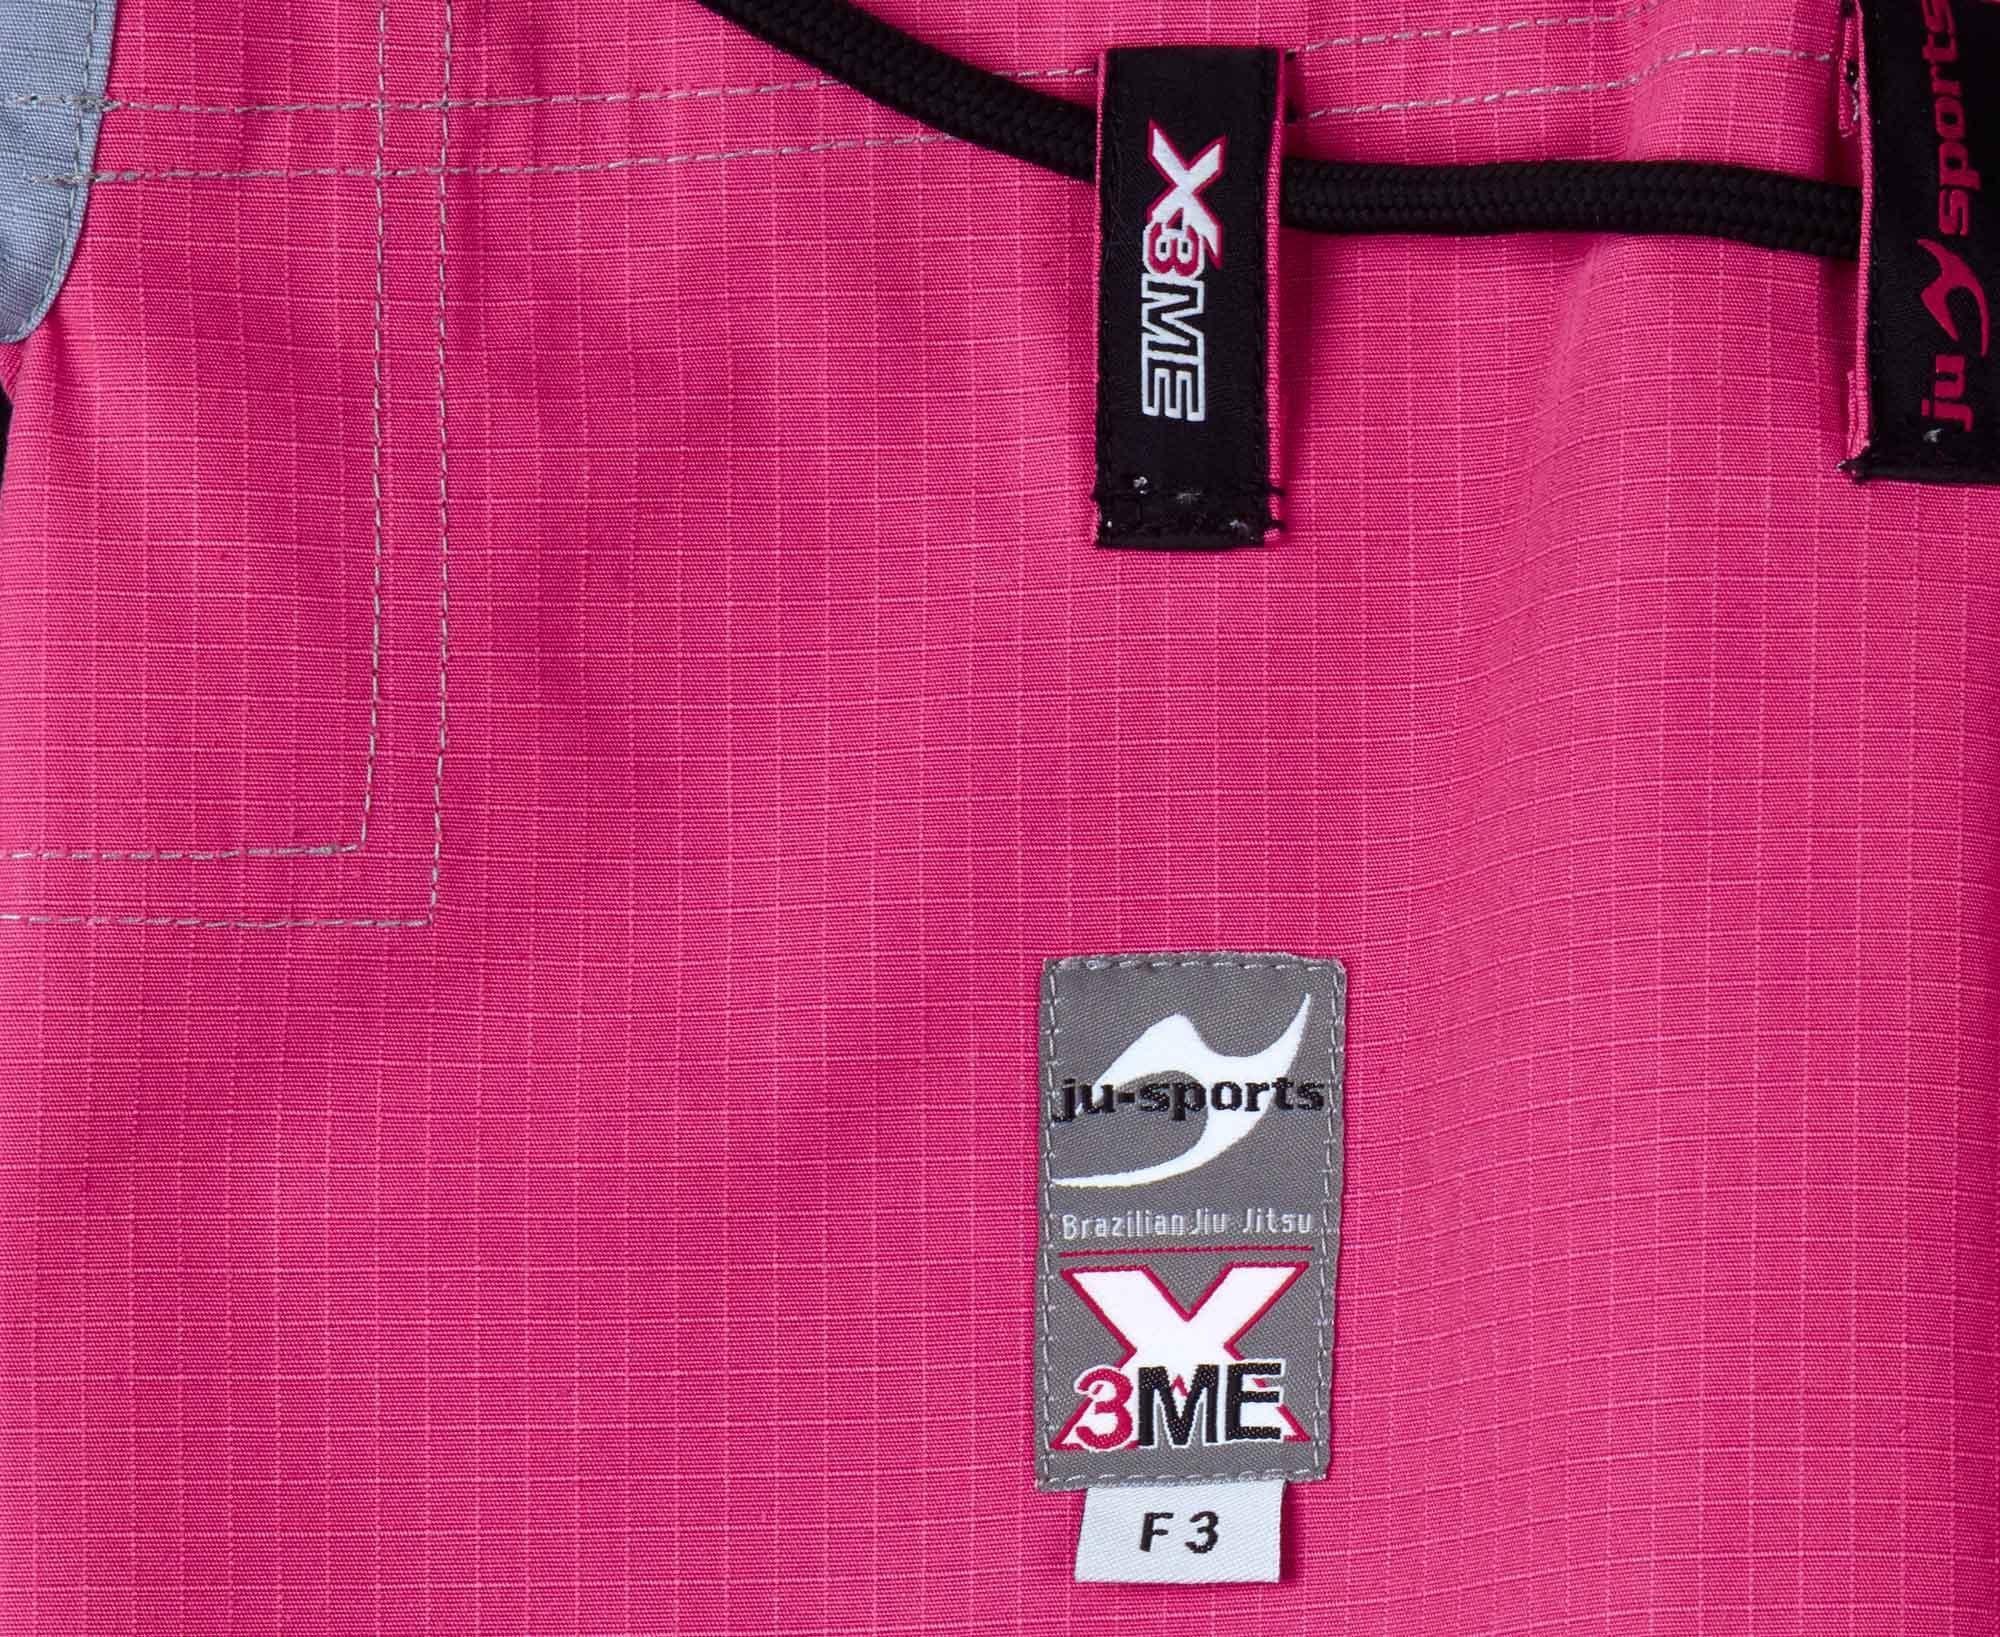 9262000-X3ME-X-treme-C16-pink-d10